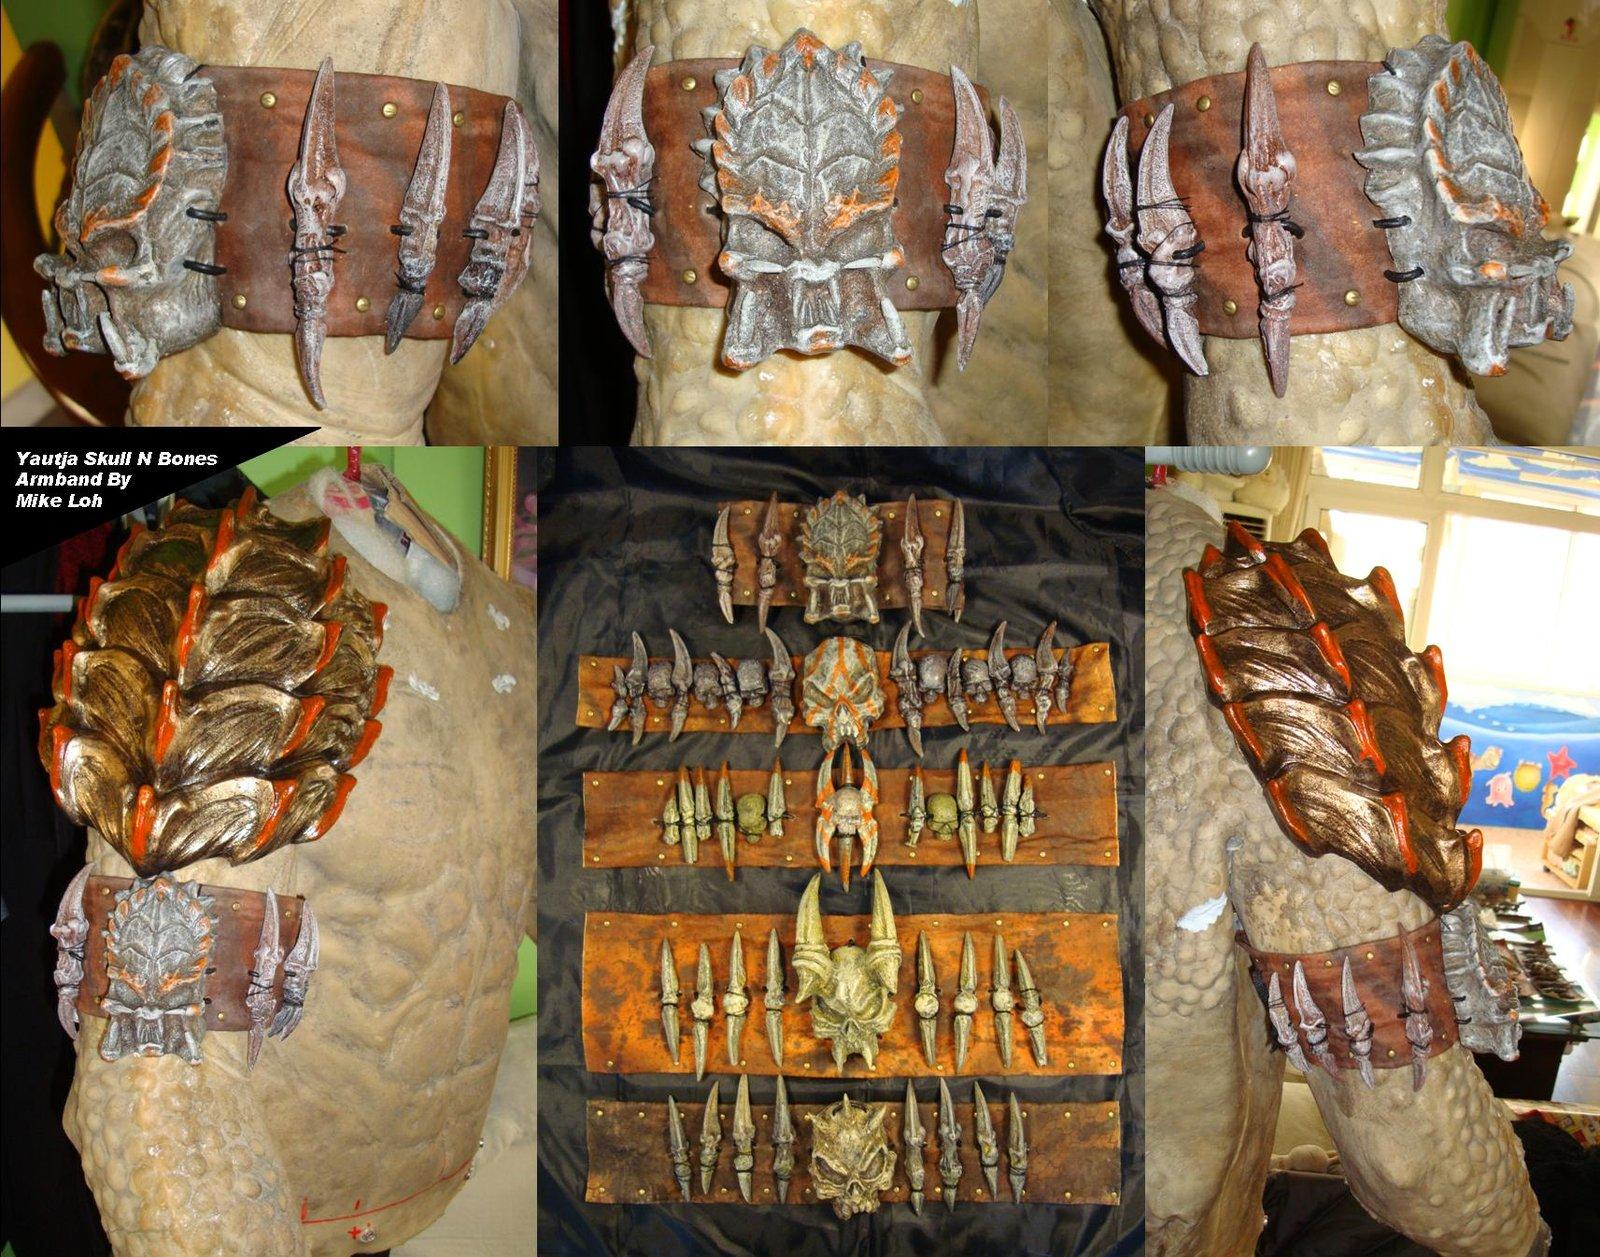 Skull_N_Bonez_Armband_Fitting_by_MichaelLoh.jpg